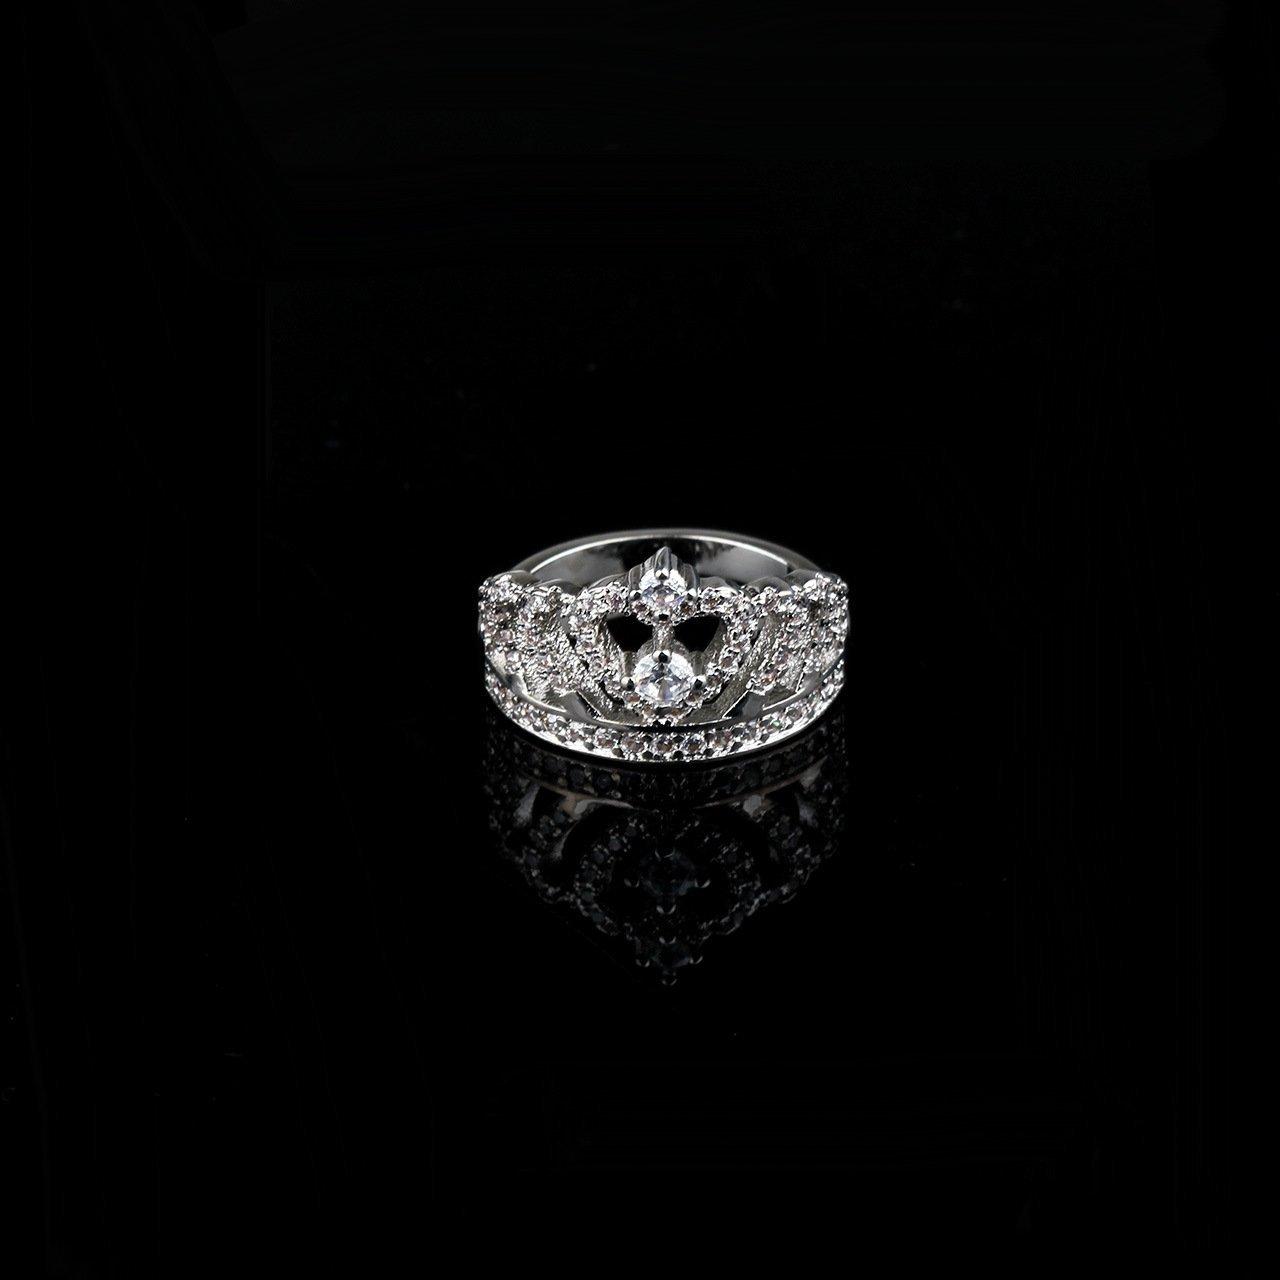 Ztuo Fashion Jewelry Cubic Zirconia Crown Ring Wedding Band for Women Girls